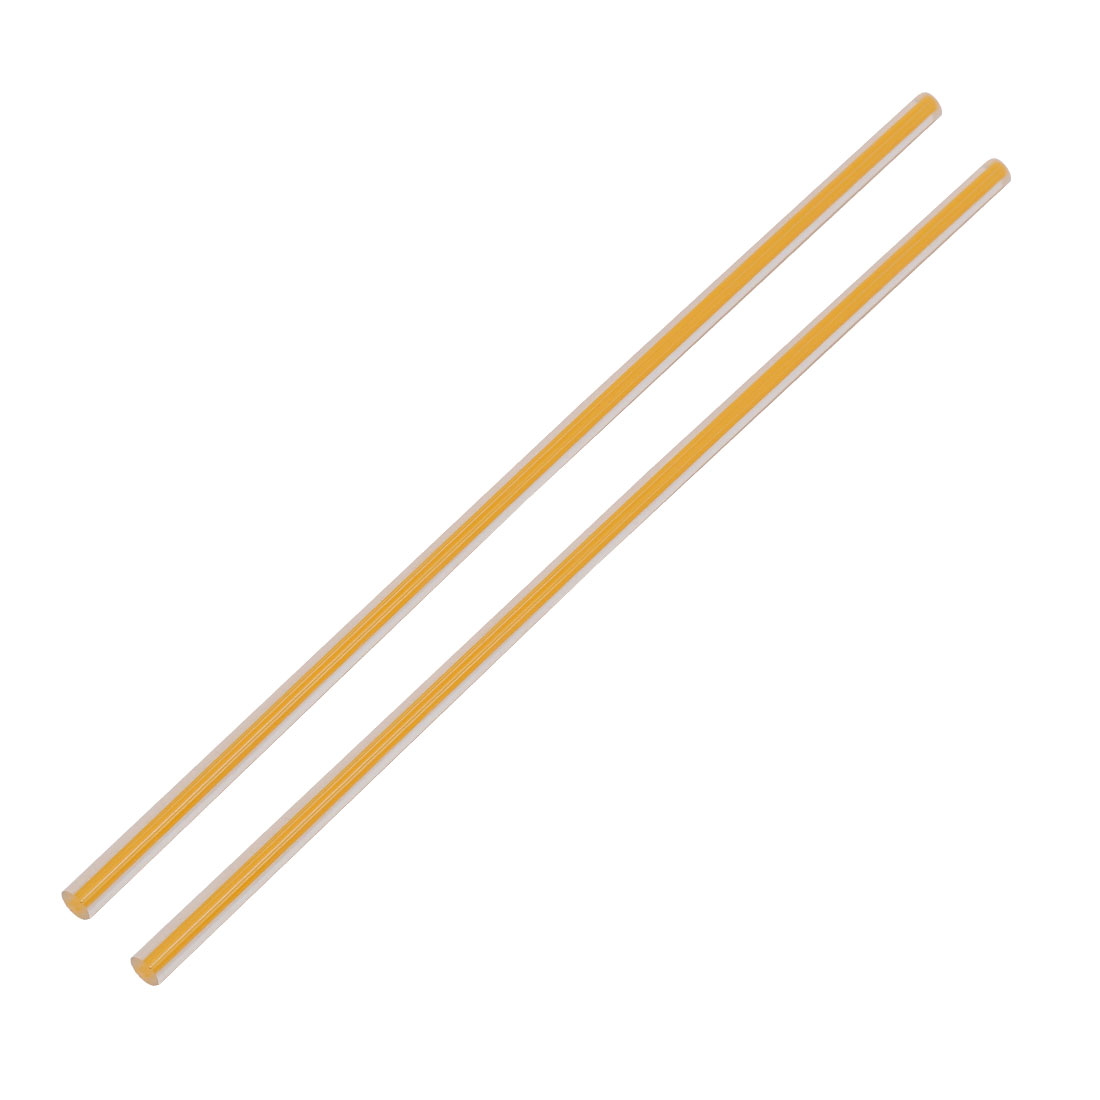 Straight Yellow Line Solid Acrylic Round Rod PMMA Bar 250mmx6mm 2pcs